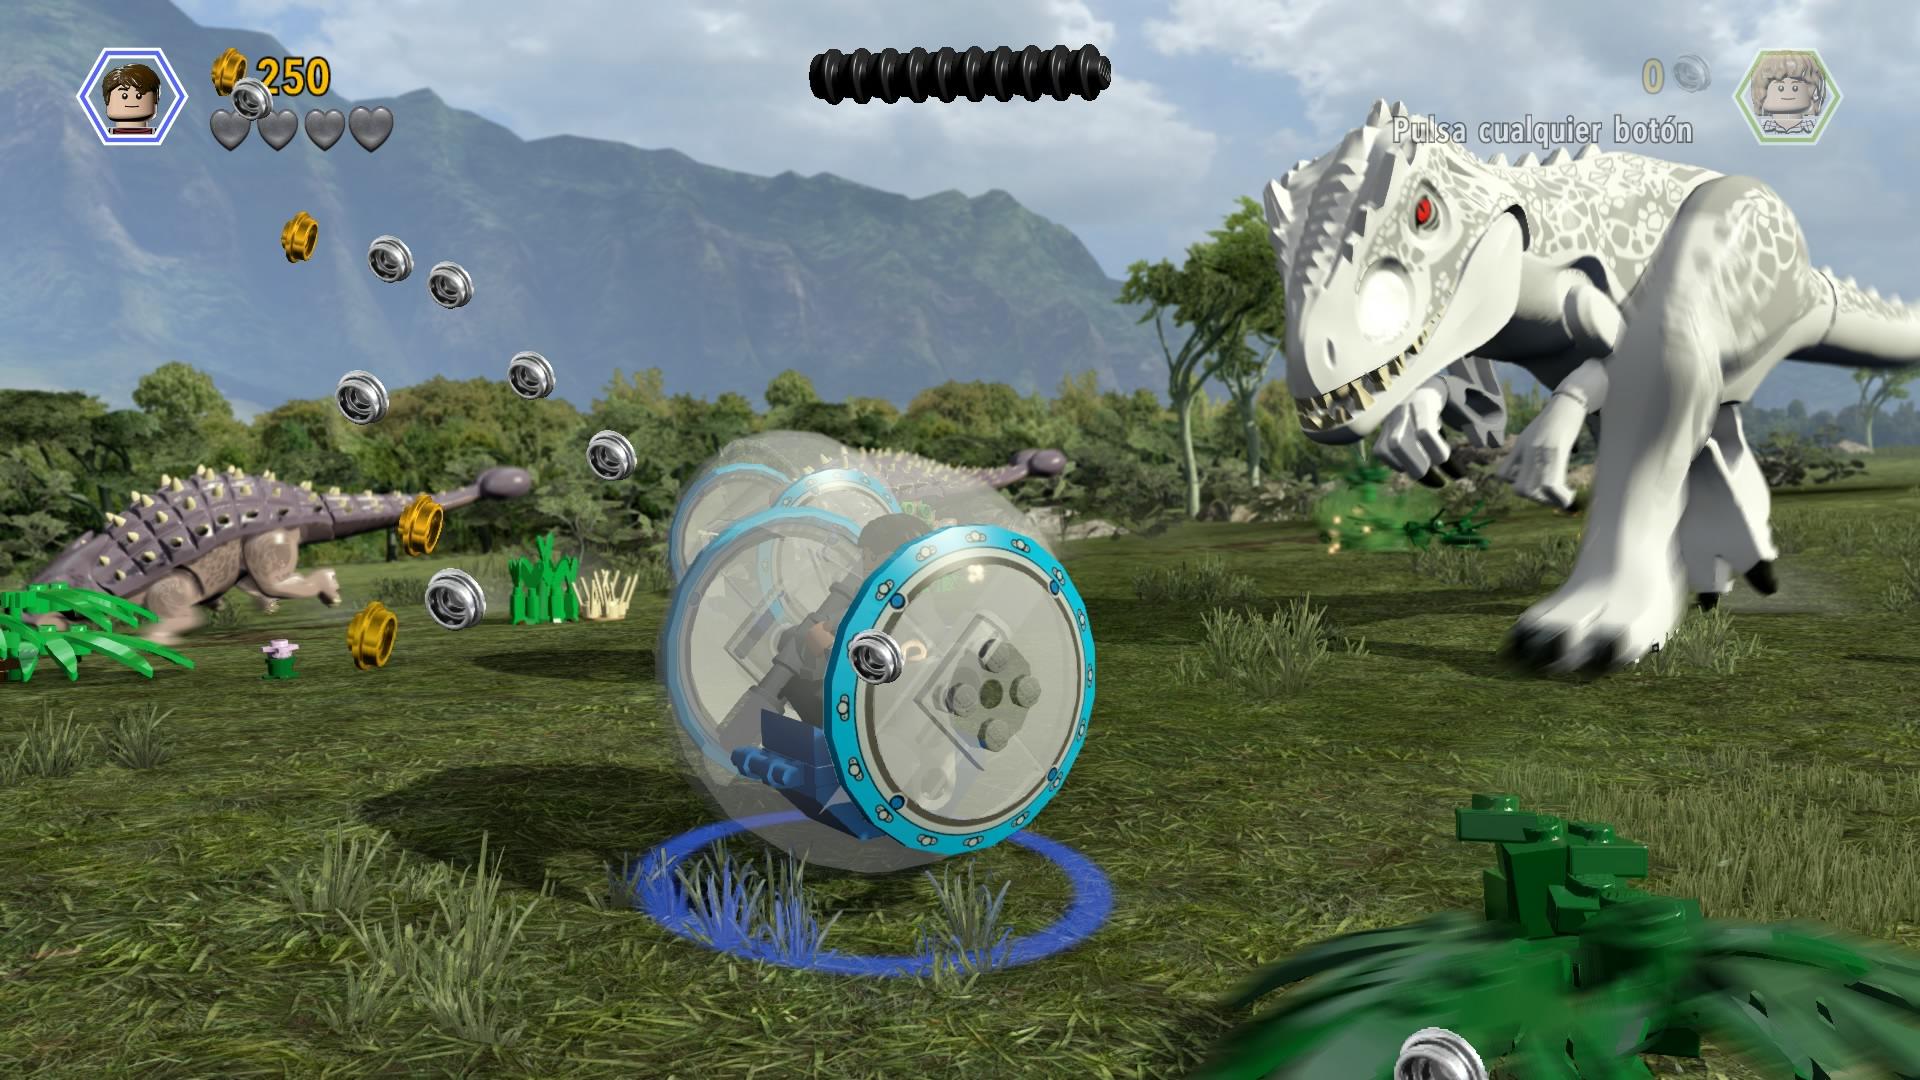 Jugando a 39 lego jurassic world 39 combogamer for Puerta jurassic world